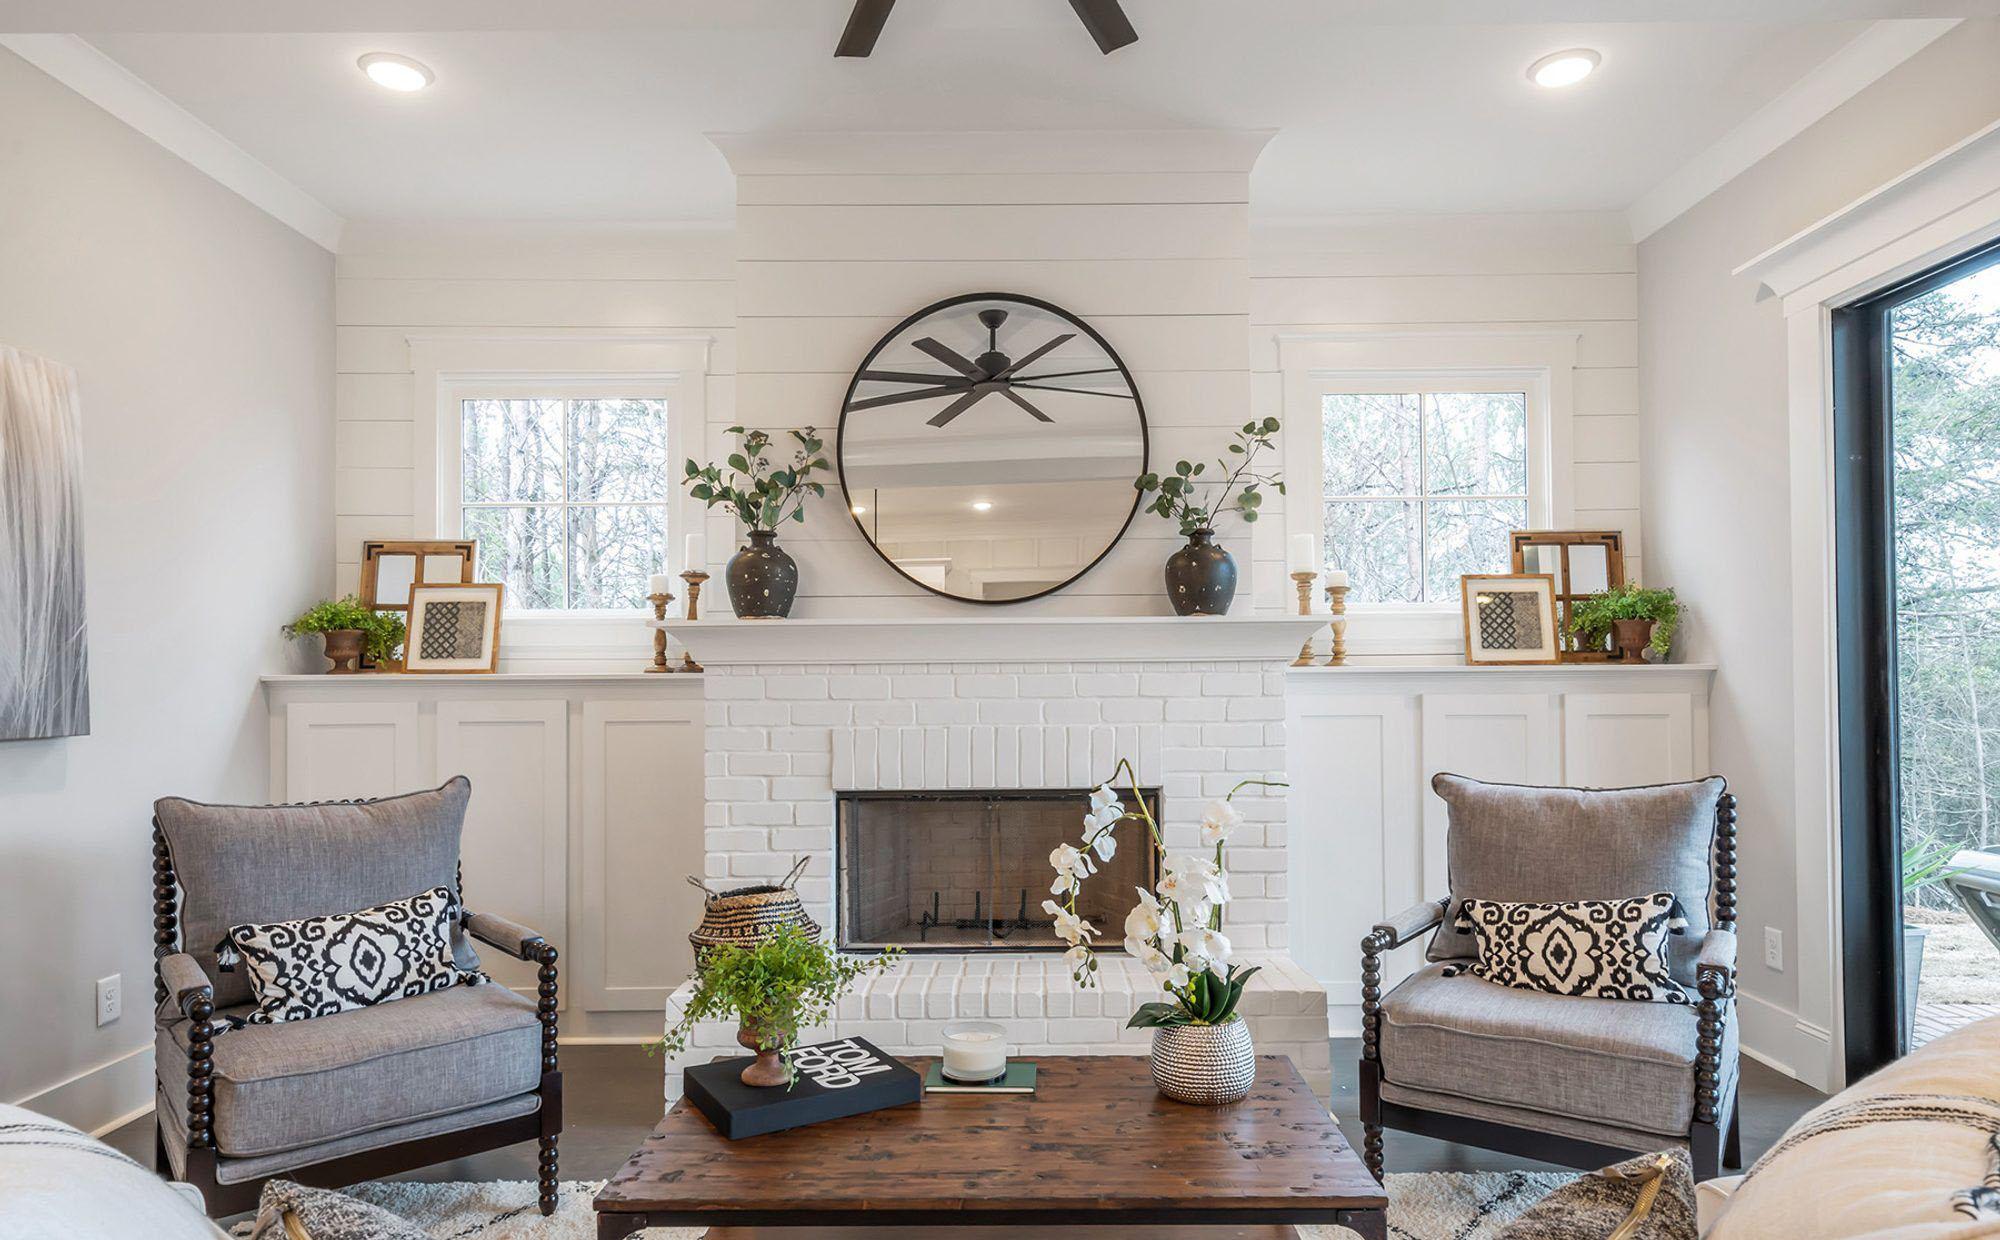 beautiful modern farmhouse fireplace surround painted white with shiplap.